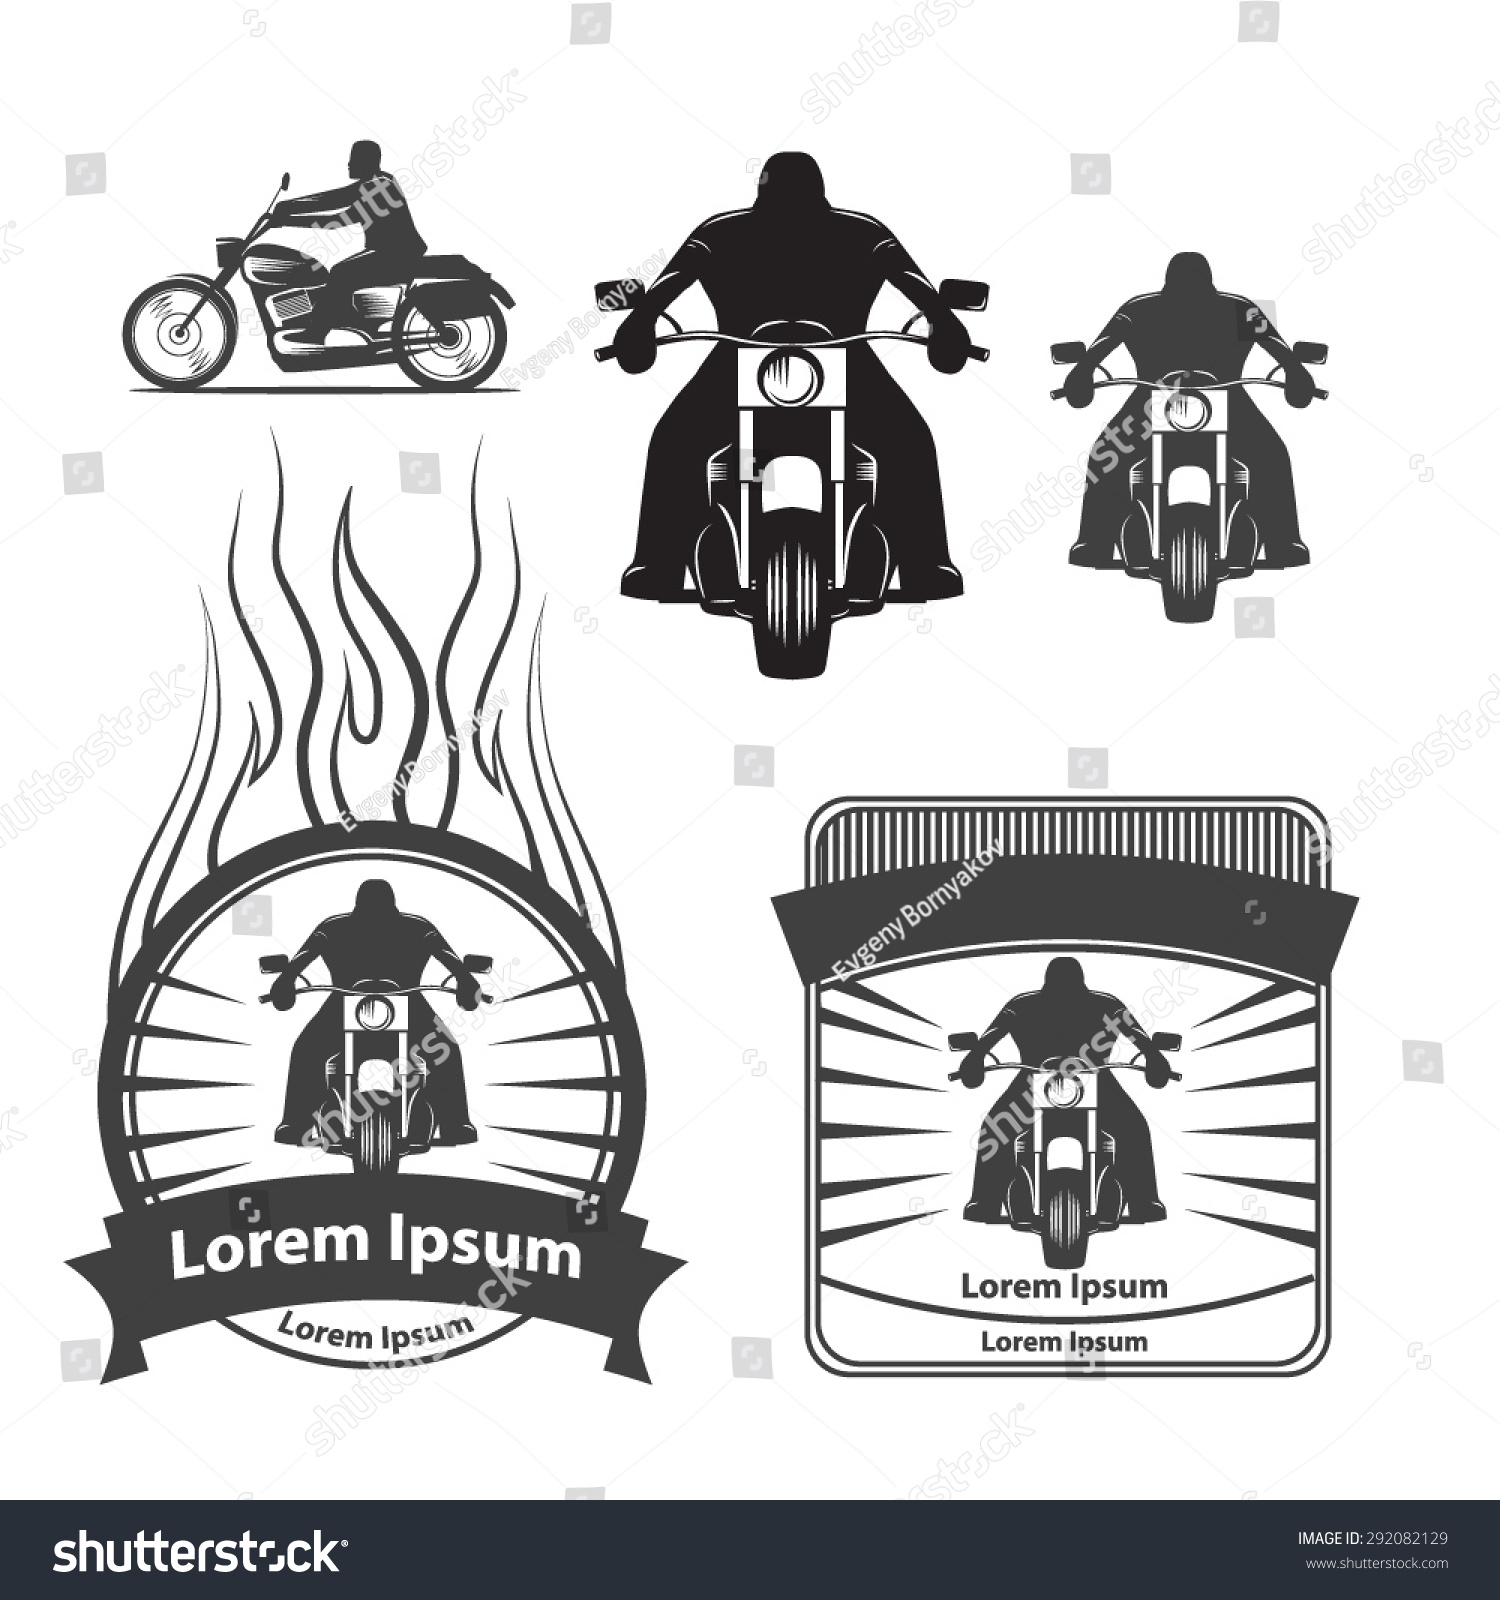 Silhouette Motorcycle Rider Simple Illustration Logo Stock Photo ...